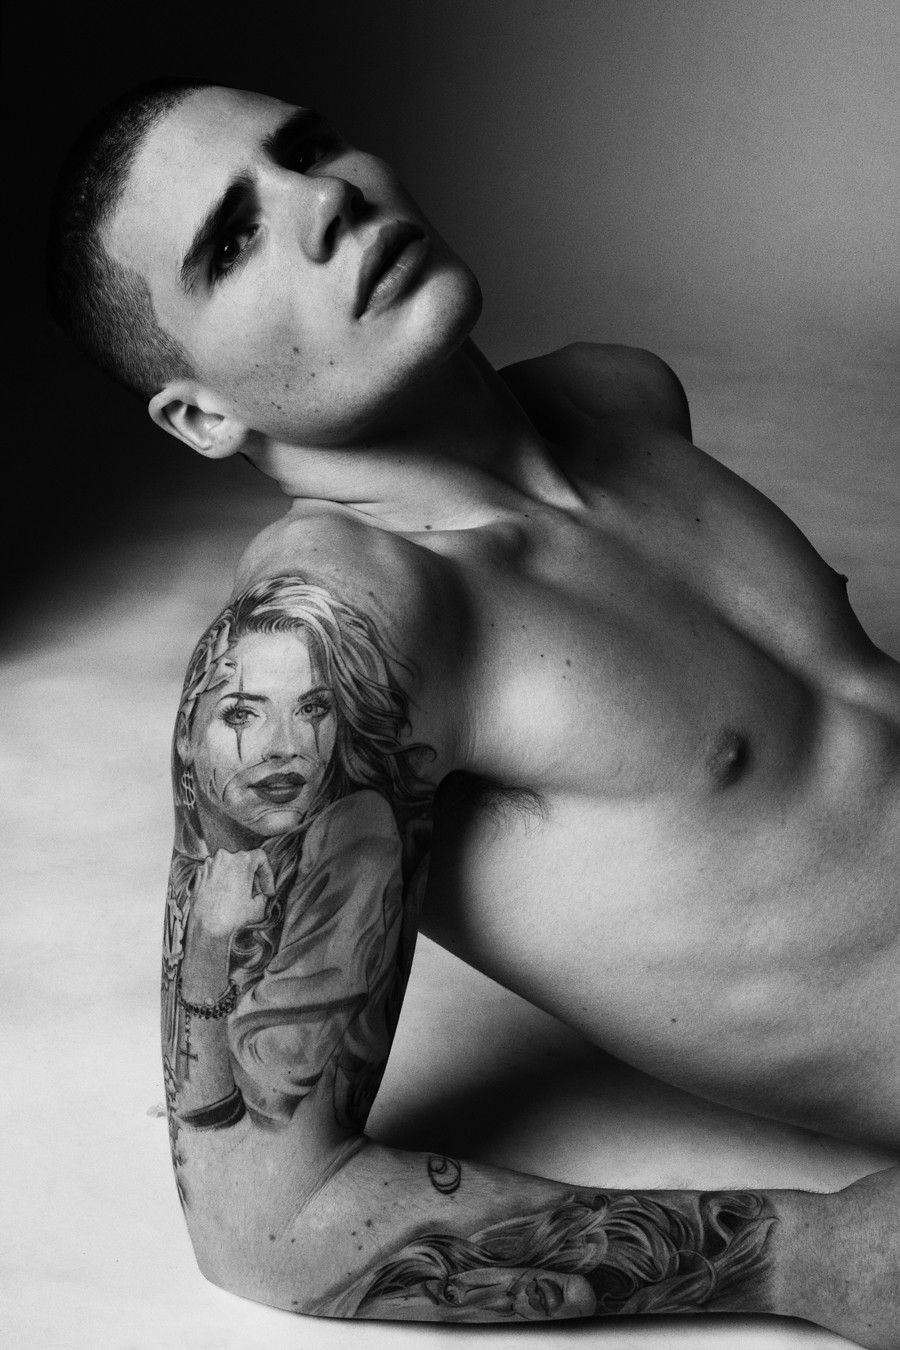 Cool tattoos for white guys toby leonard  tattoo  pinterest  tatted men tattoo and tatting